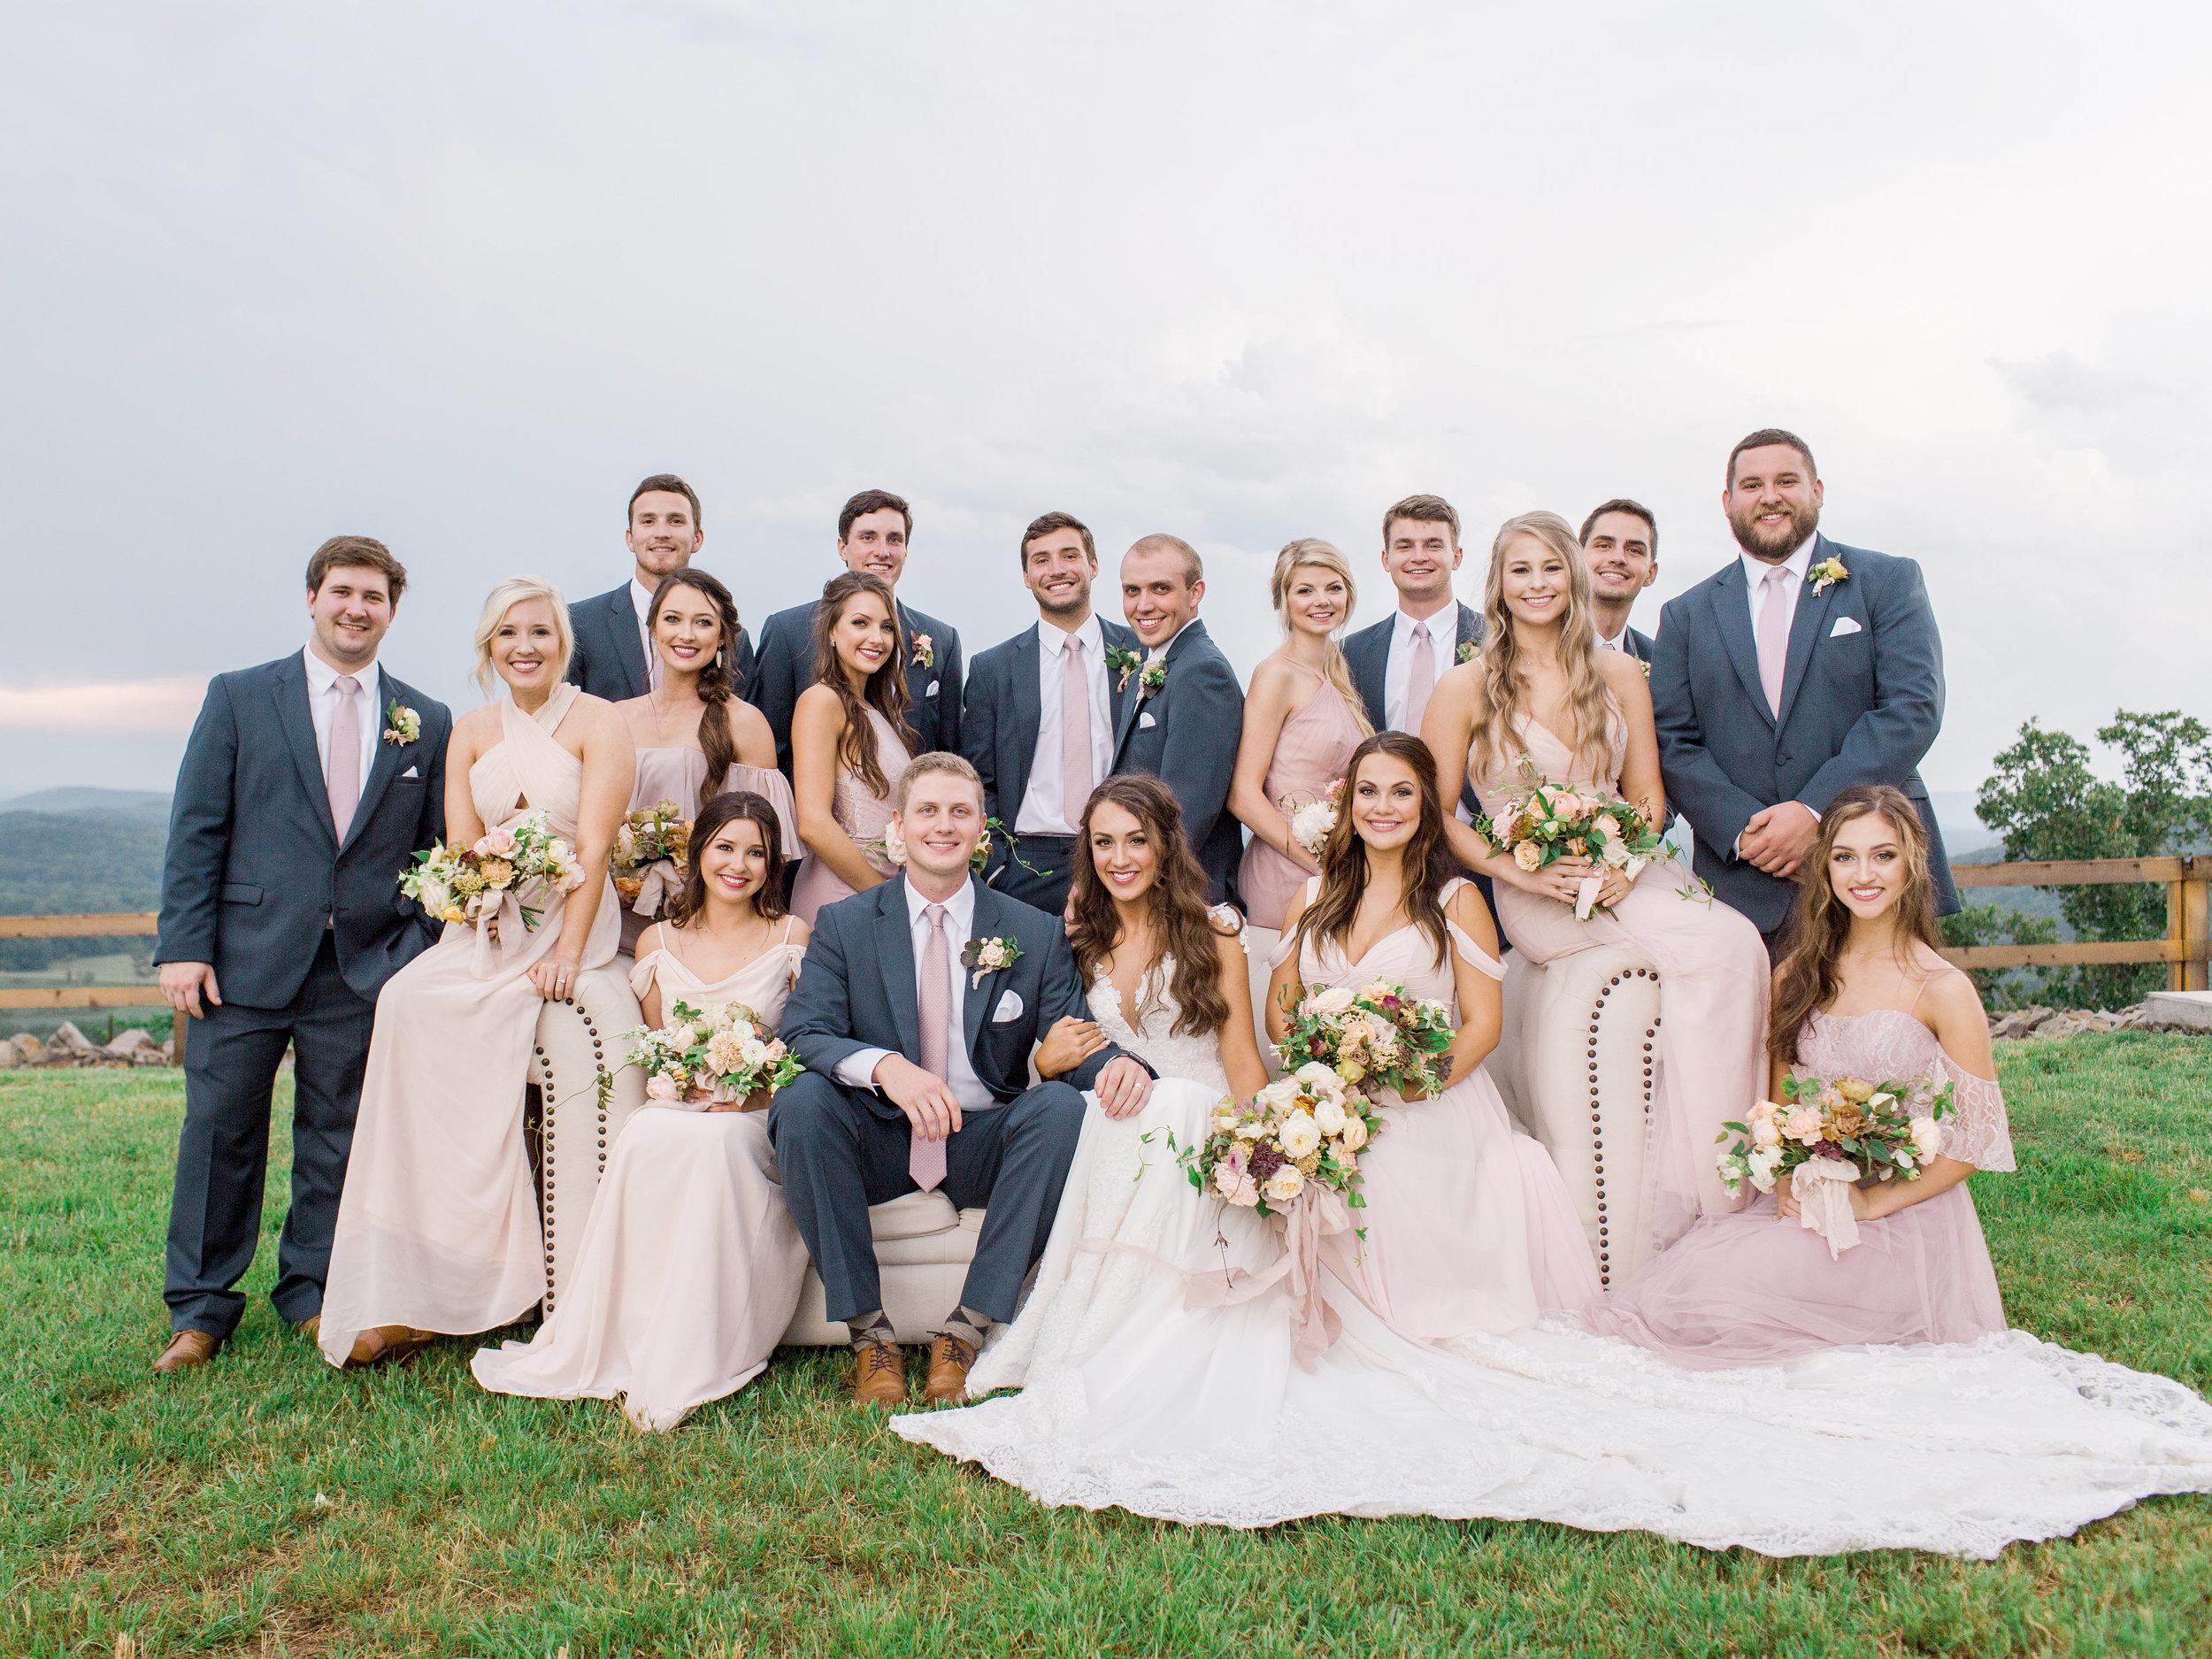 jessica-zimmerman-events-arkansas-mountain-wedding-bridal-party.jpg